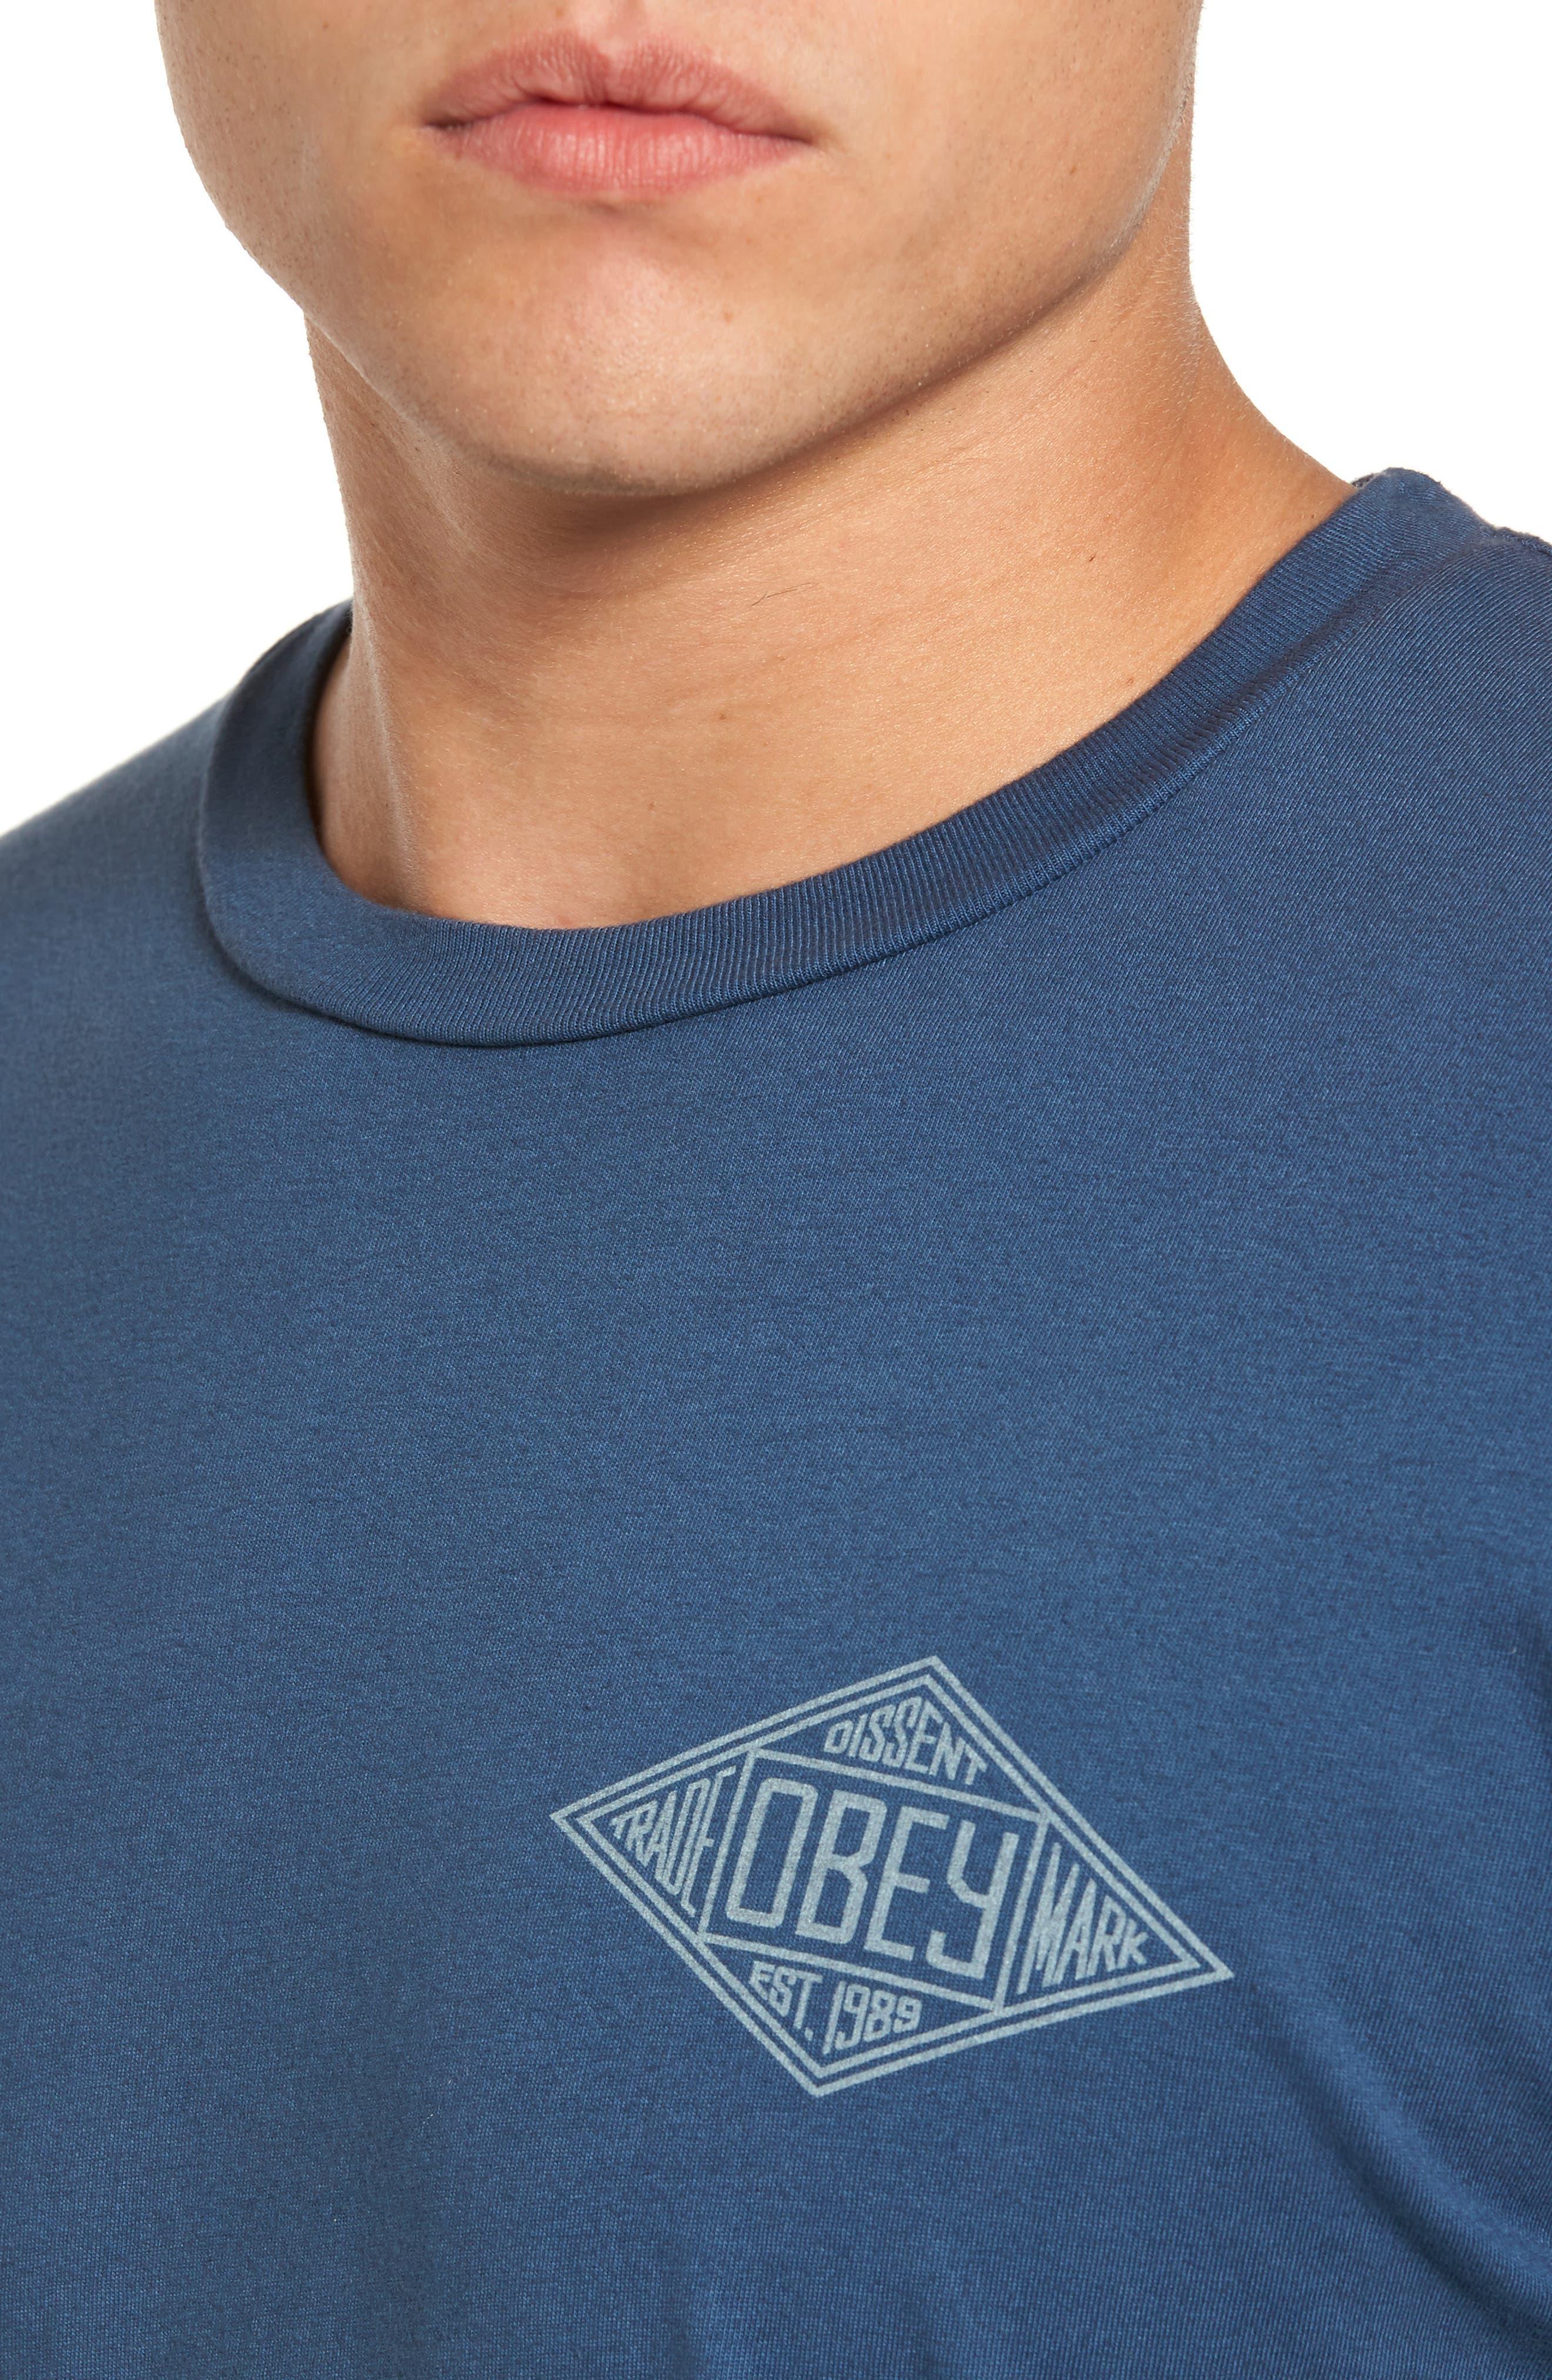 Trademark Diamond T-Shirt,                             Alternate thumbnail 4, color,                             424